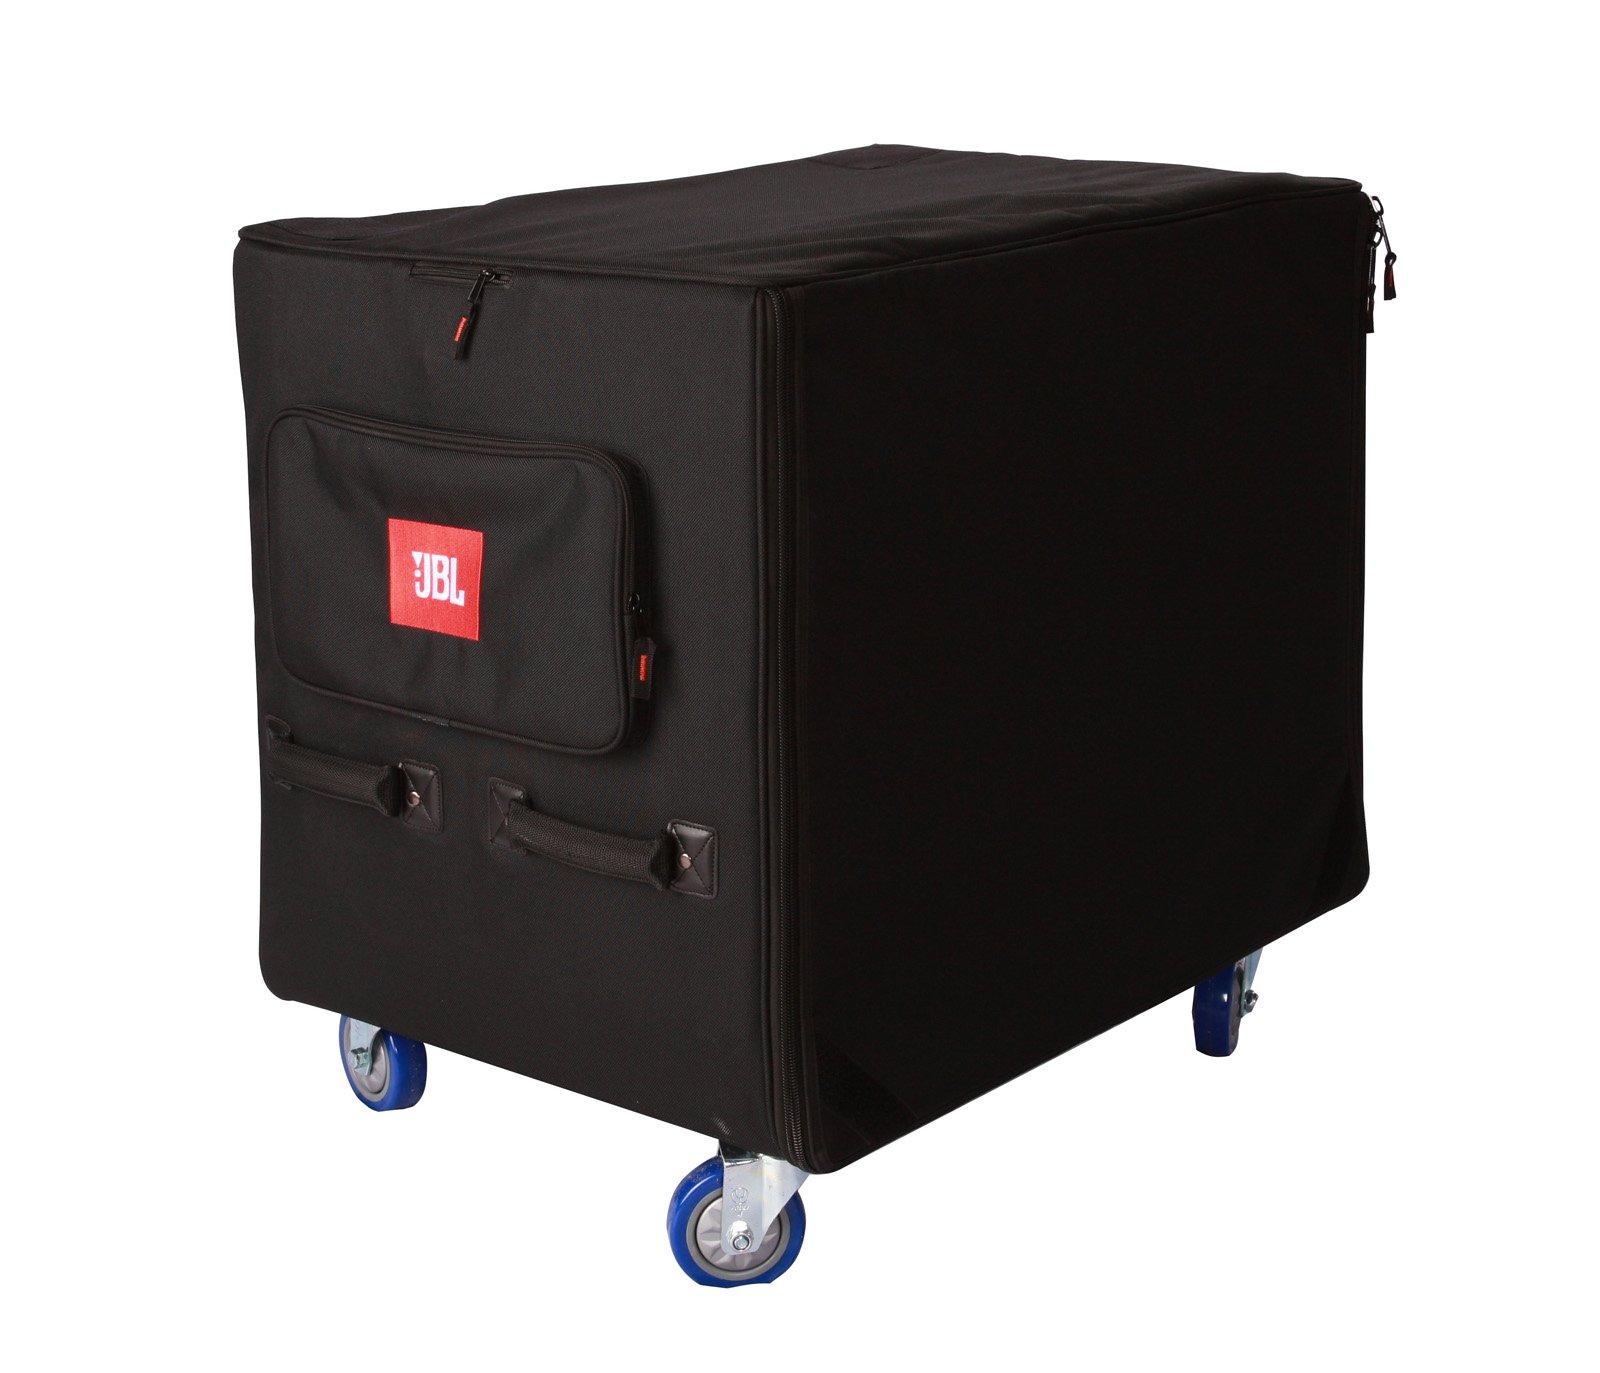 JBL Rolling Sub Transporter Bag for VRX918S Speaker - Black (VRX918S-STR)